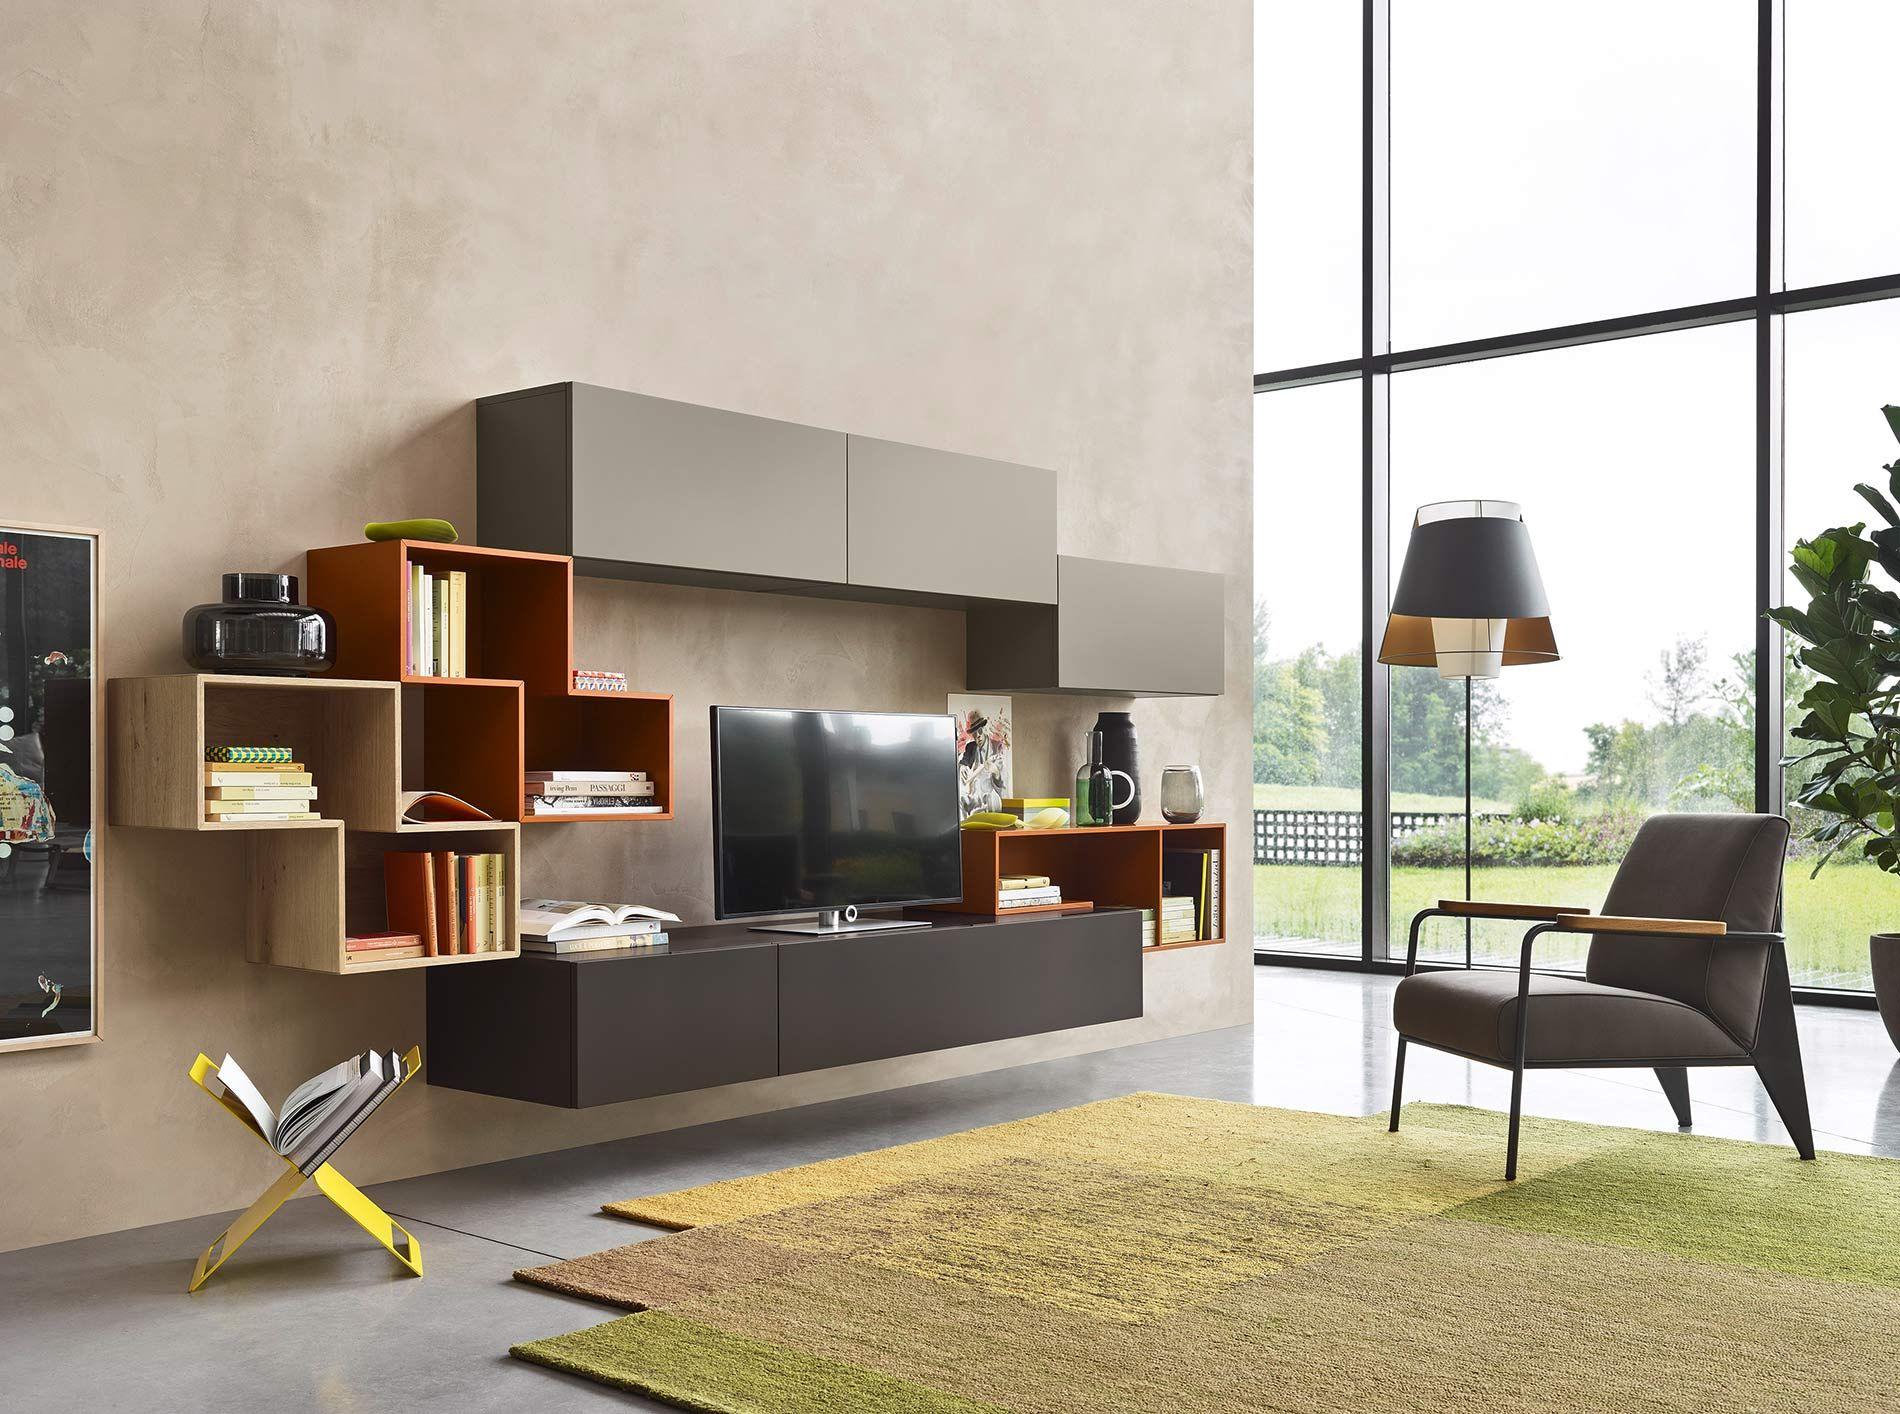 media wohnwand musterring wohnwand musterring q media. Black Bedroom Furniture Sets. Home Design Ideas